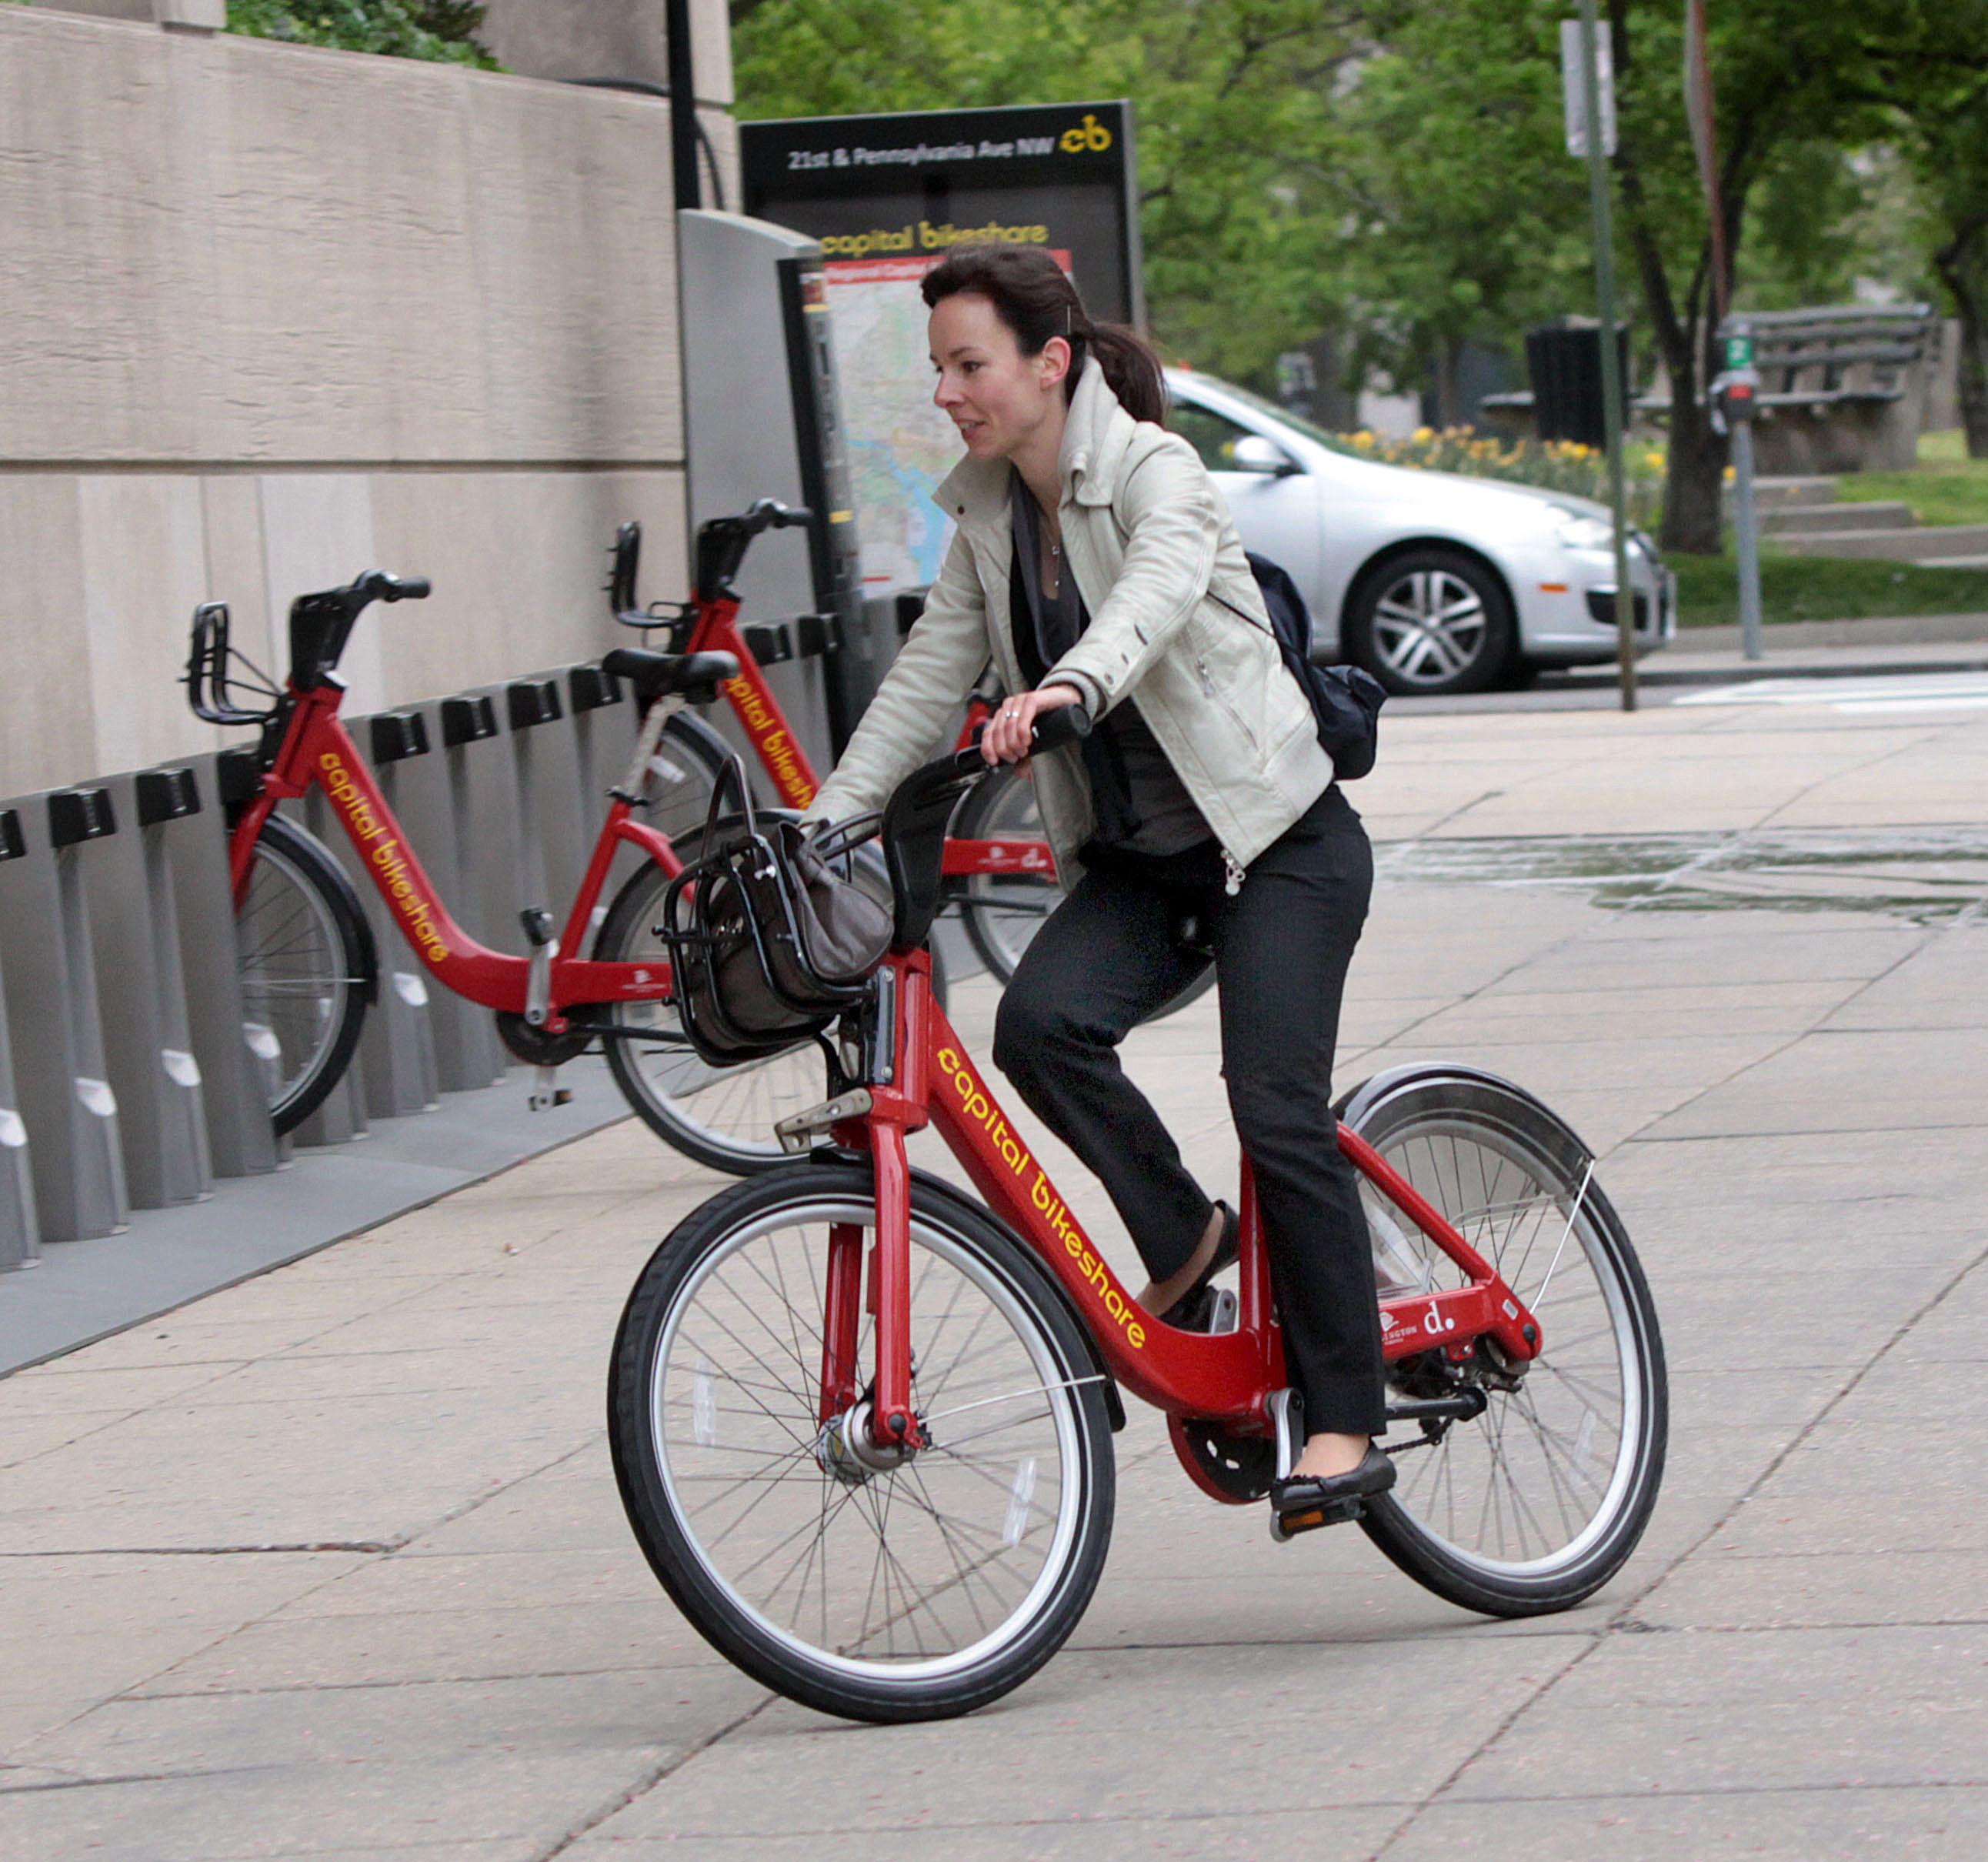 Capital Bikeshare, Washington, D.C.